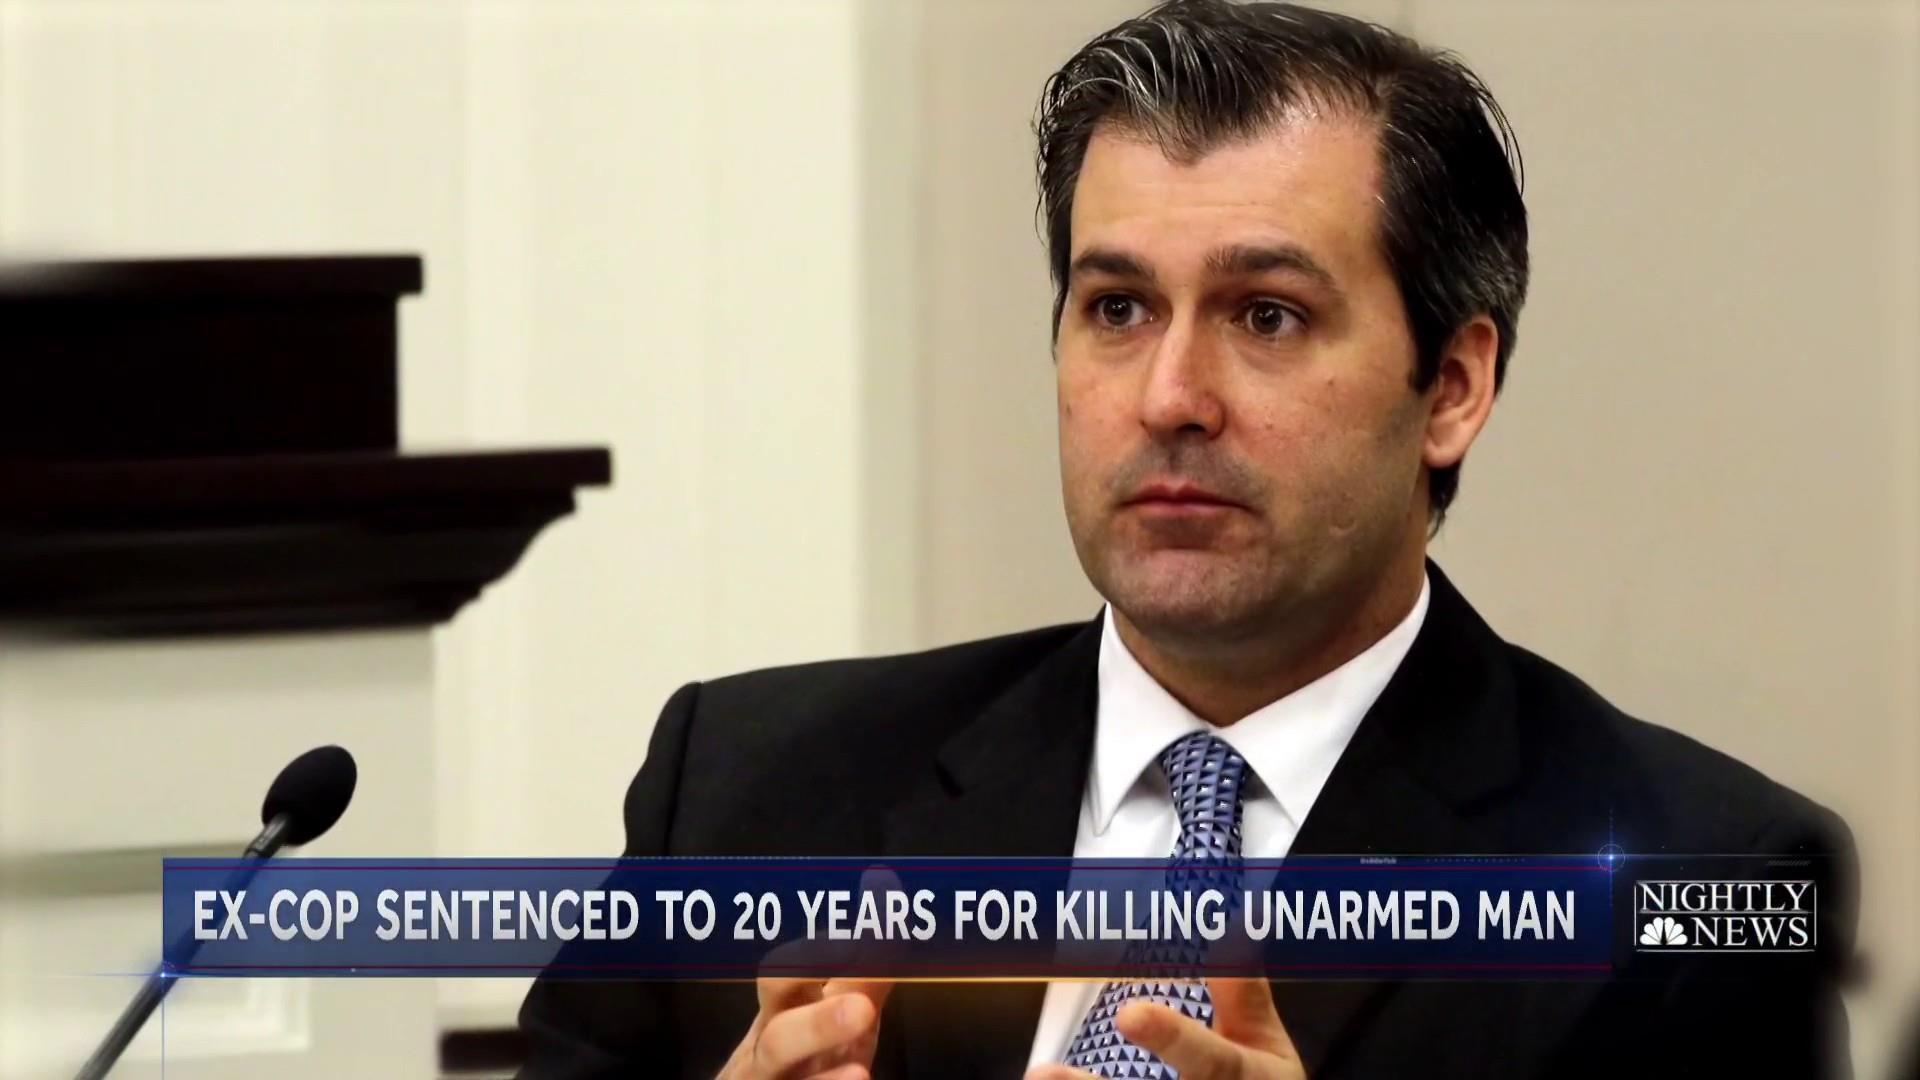 Walter Scott shooting: Michael Slager, ex-officer, sentenced